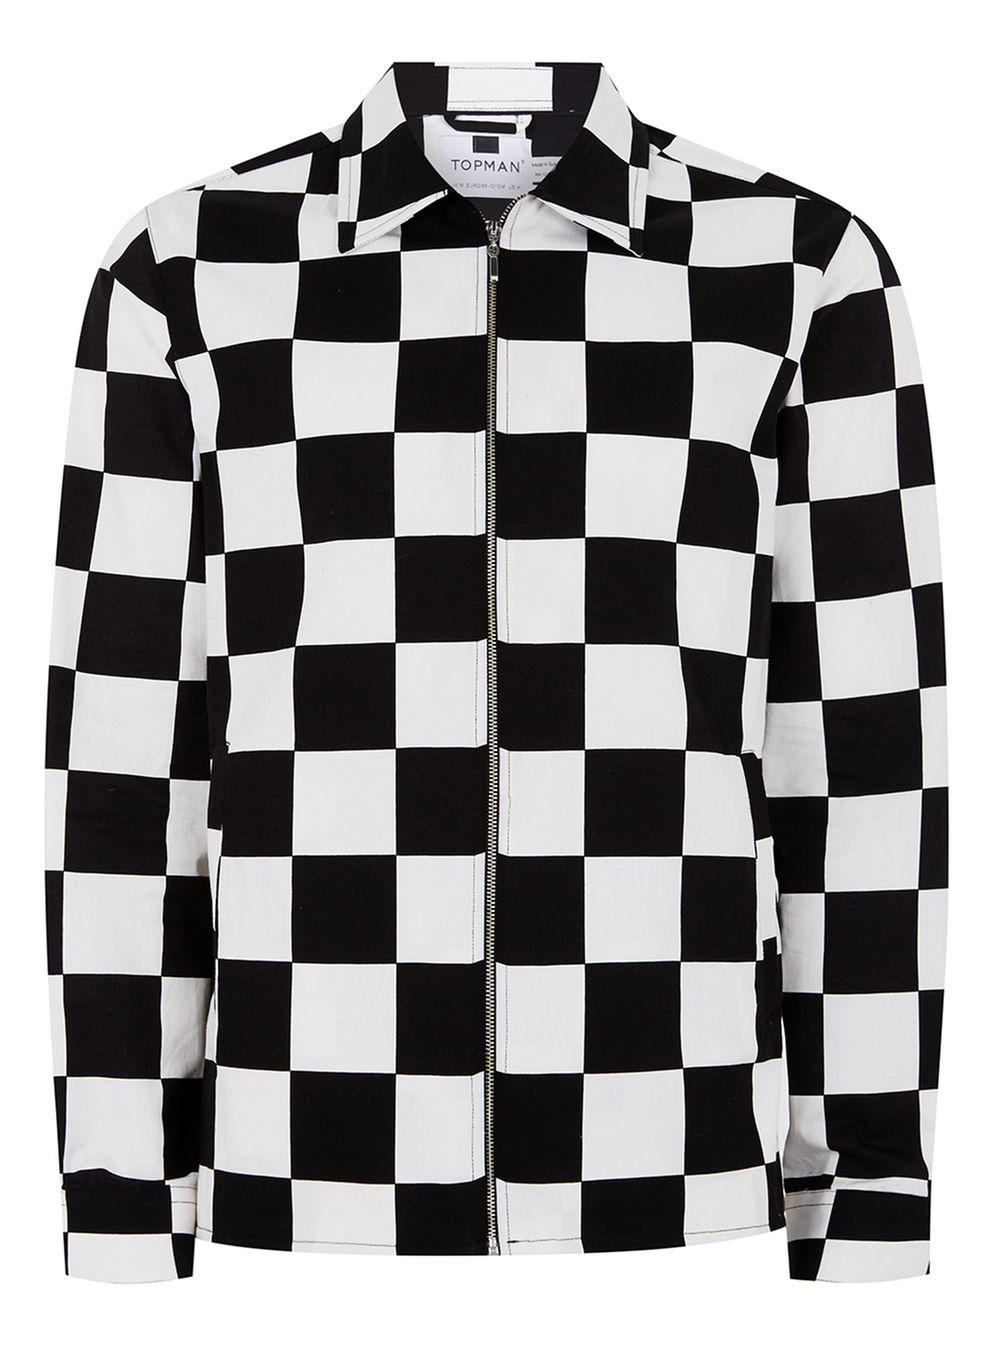 Topman black and white check shirt in black for men lyst for Black and white check mens shirt